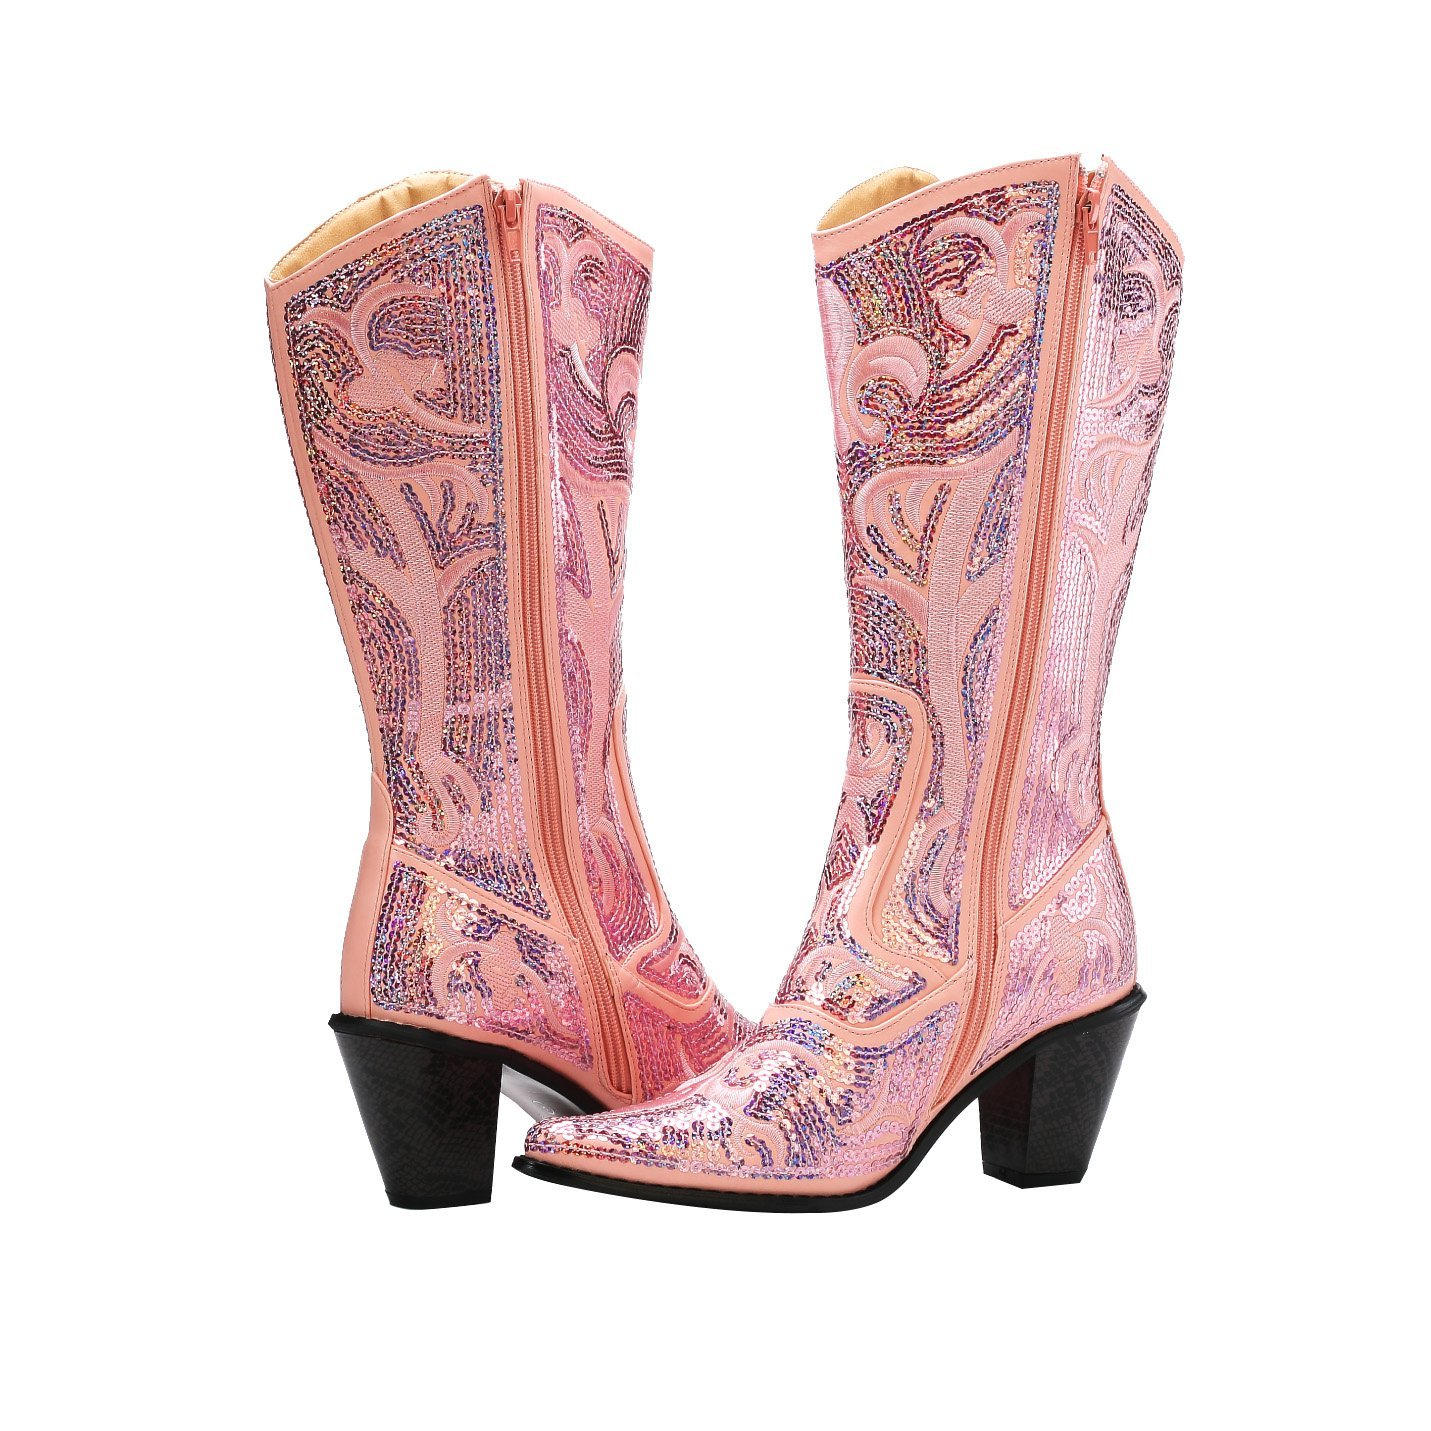 Helens Heart Bling Boots B00MC8F26A 5 B(M) US|Pink